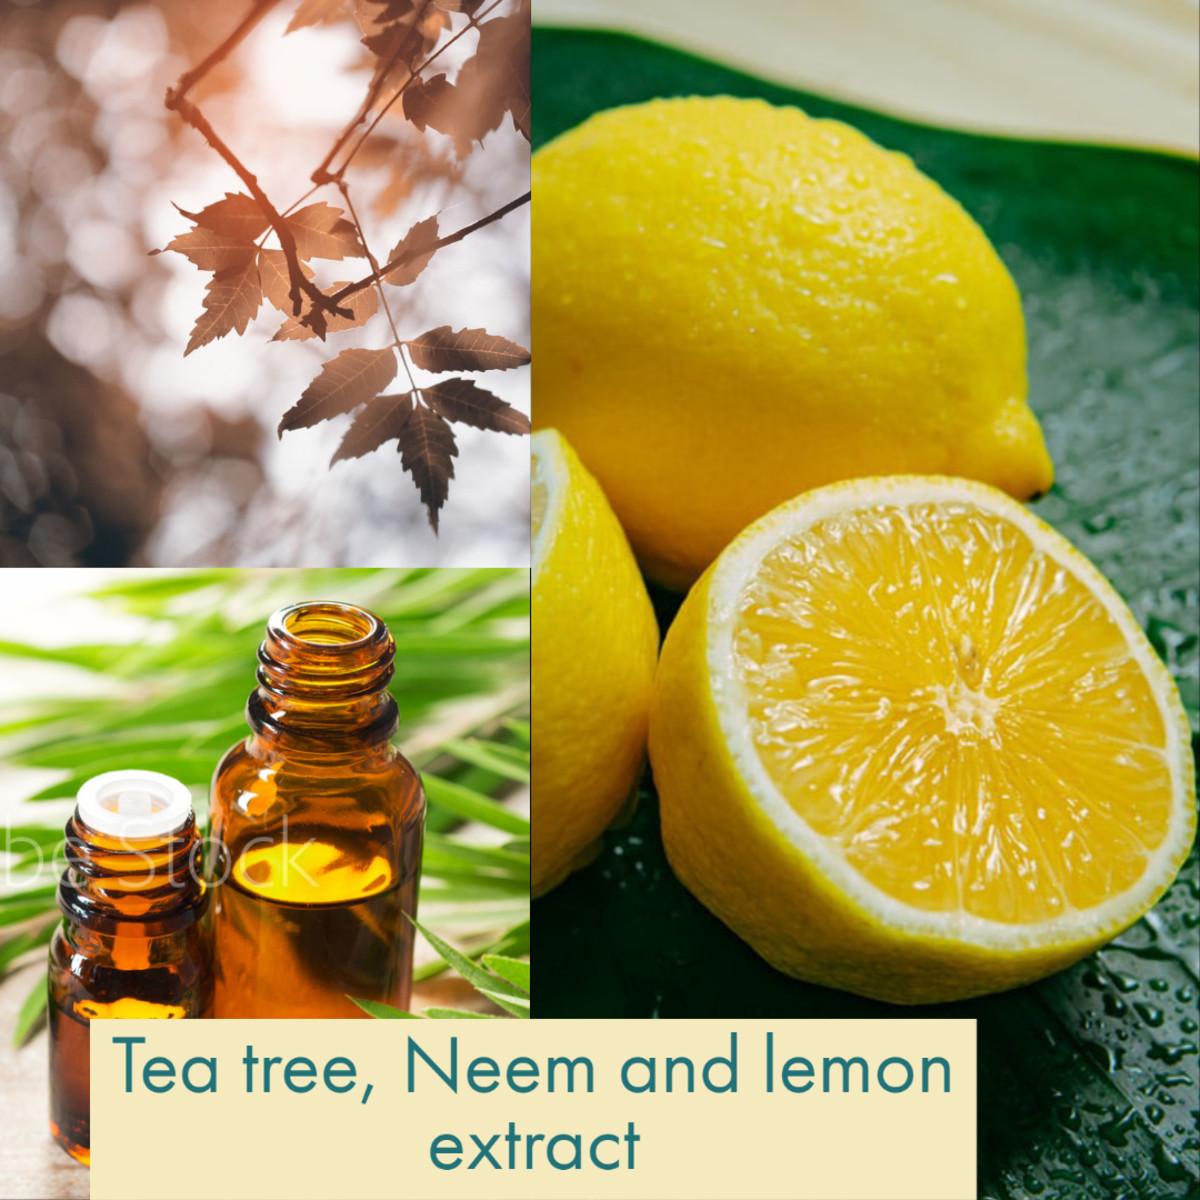 Ingredients for facewash